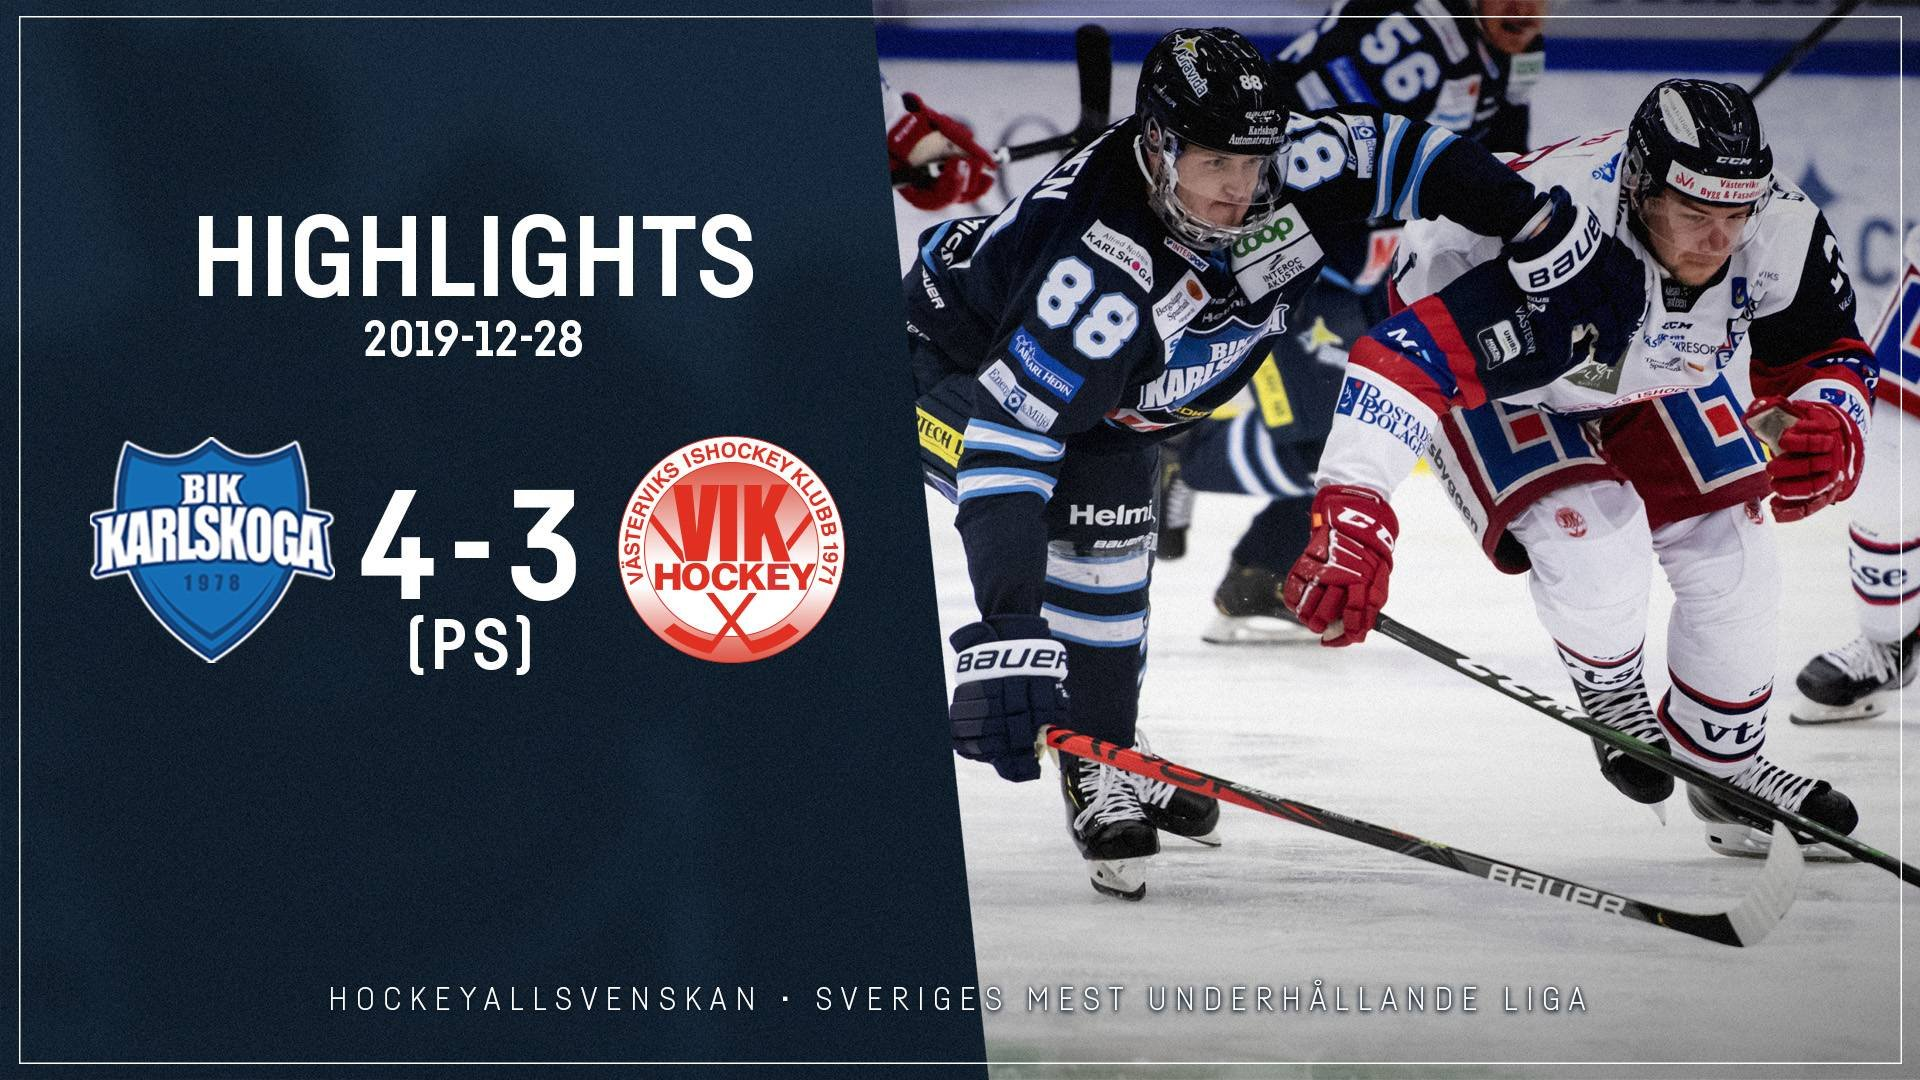 2019-12-28 Karlskoga - Västervik 4-3 (PS)